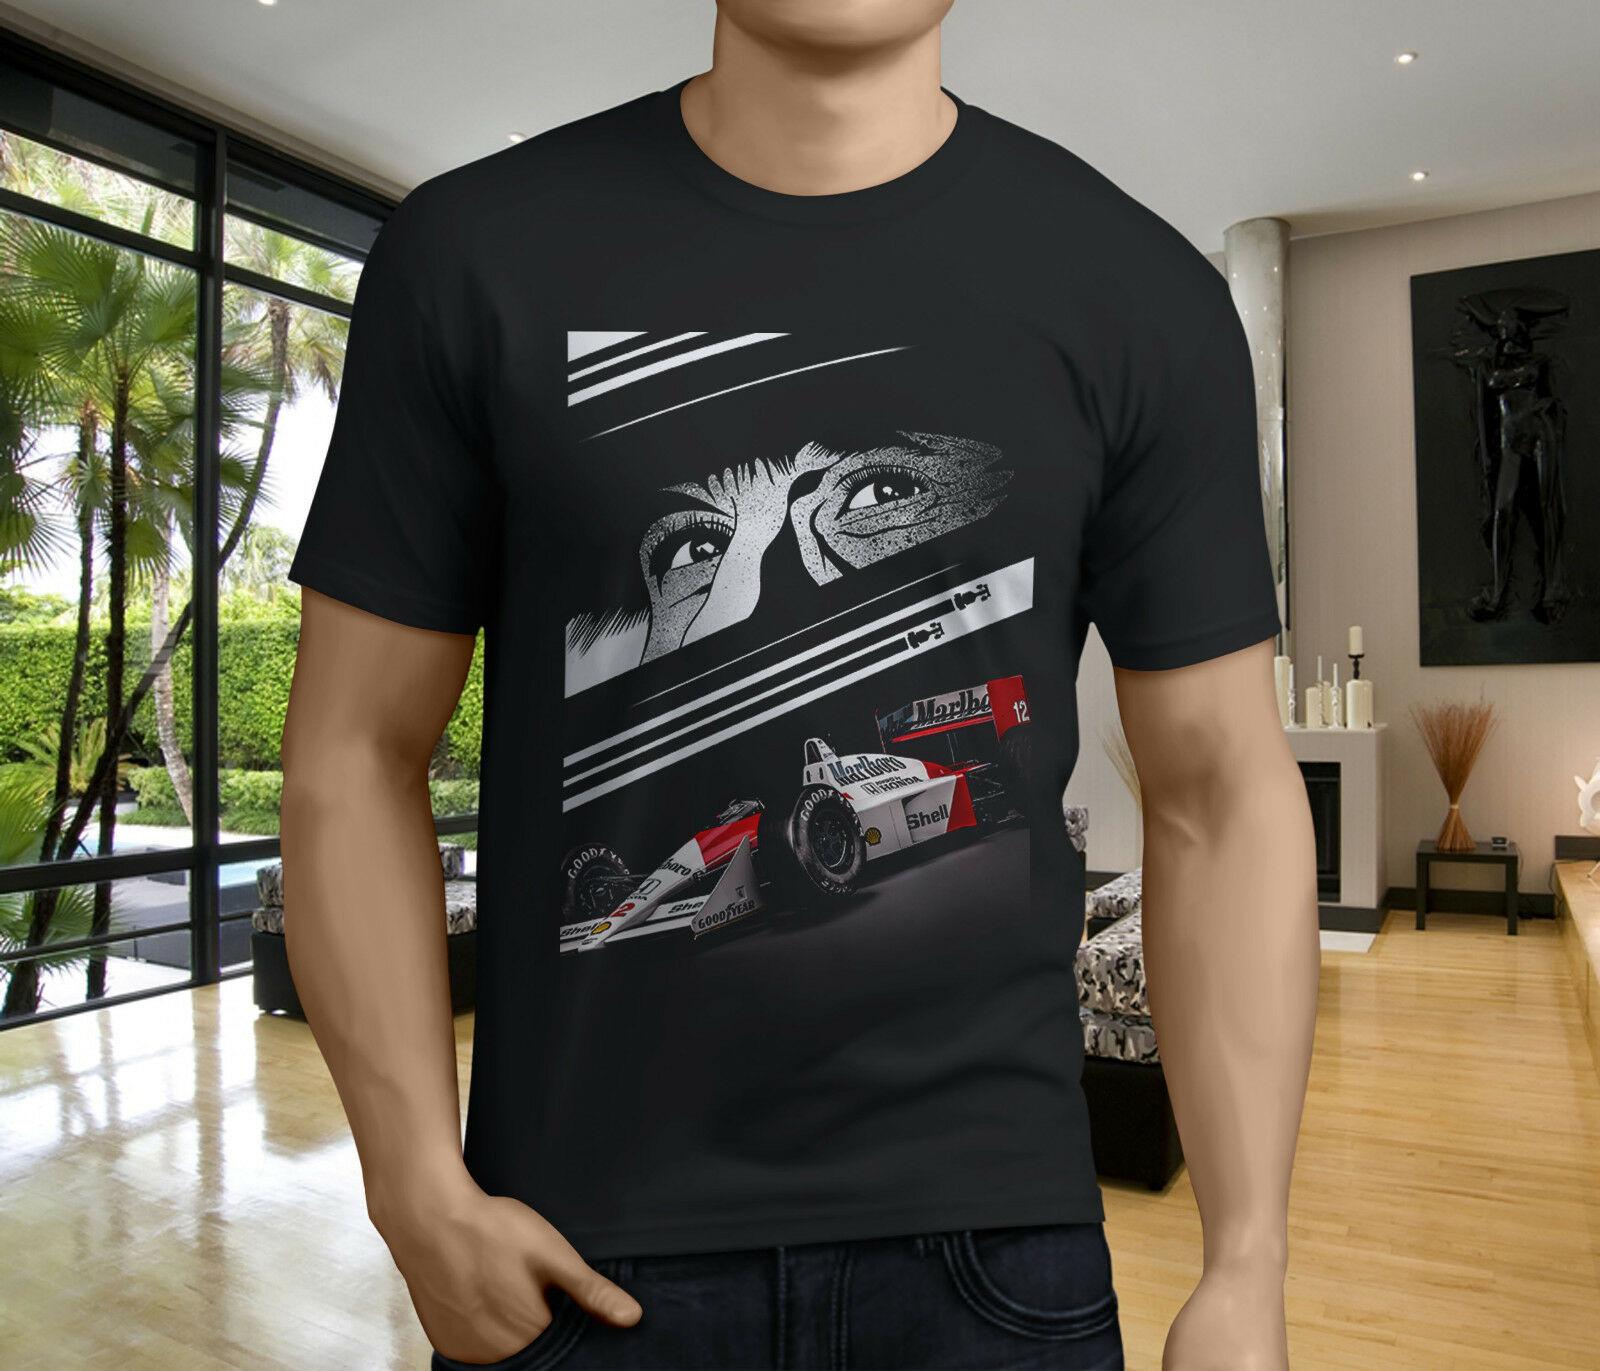 2019-funny-new-ayrton-font-b-senna-b-font-world-championship-legend-men's-black-t-shirt-unisex-tee